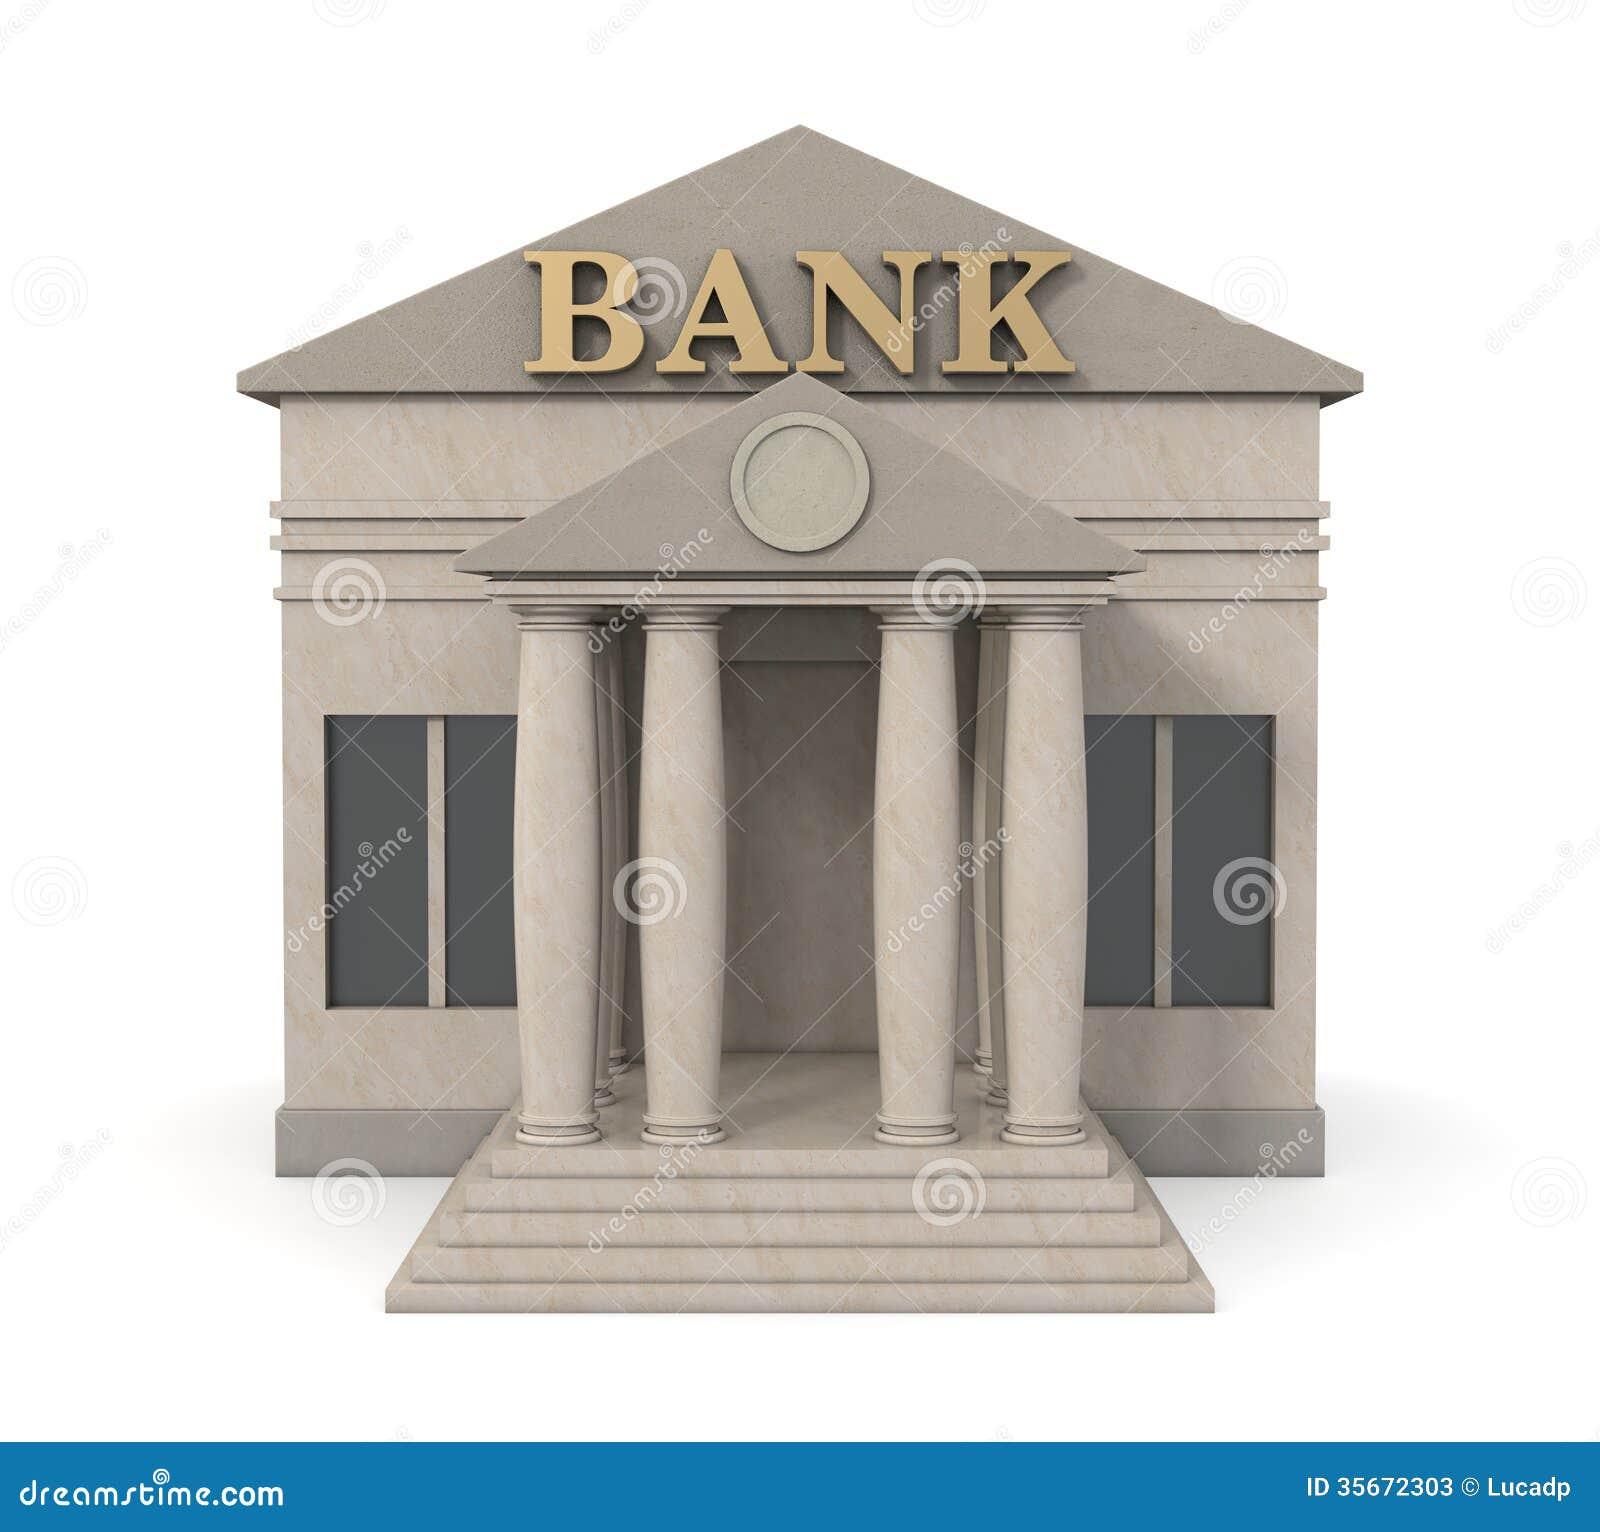 Image Bank